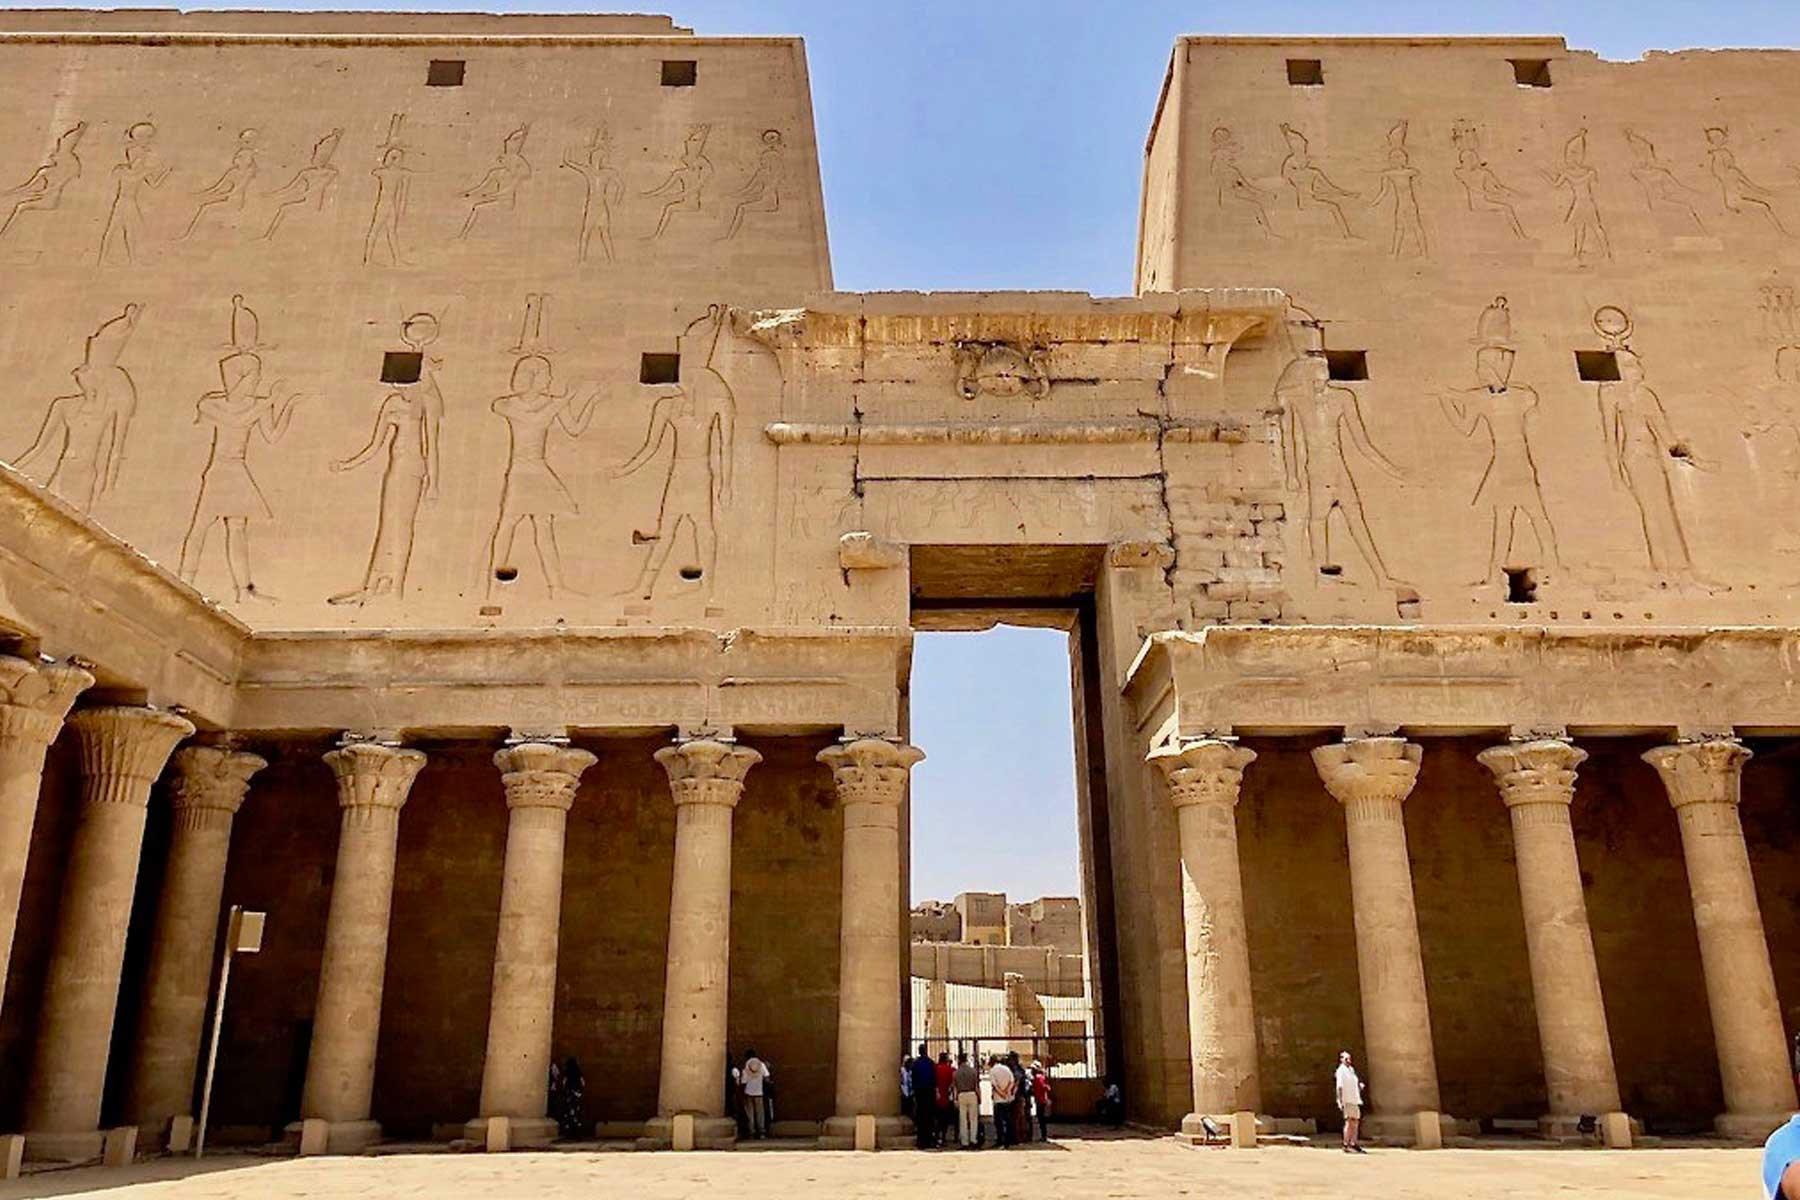 the temple of Edfu